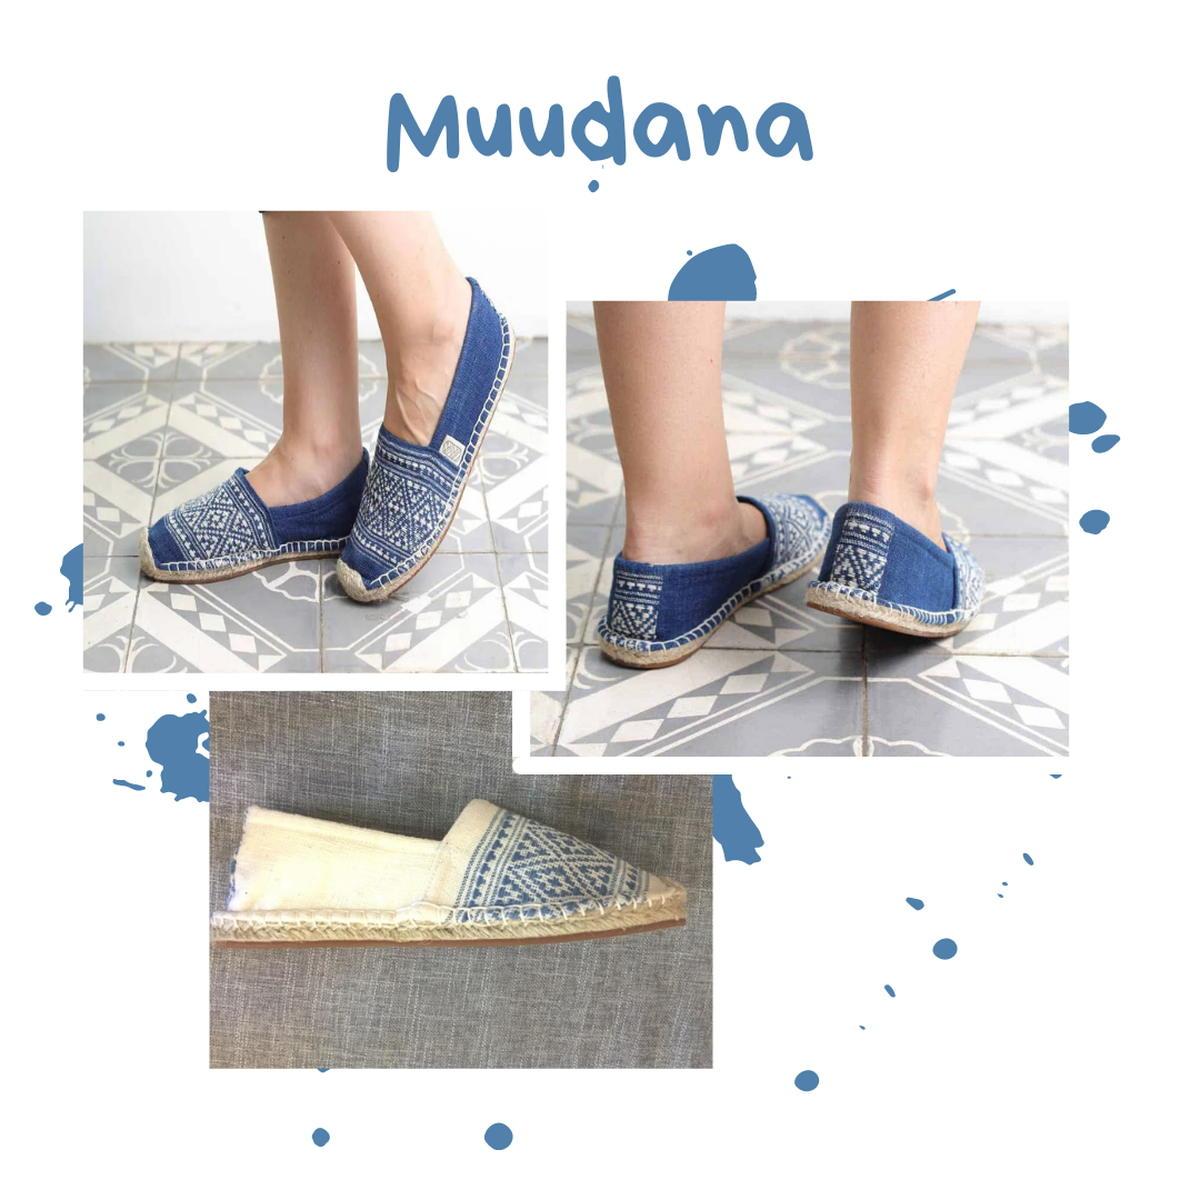 Muudana - Espadrilles - bleu - blanche - tissage - upcycling - indigo - mixte - homme - femme - cambodge